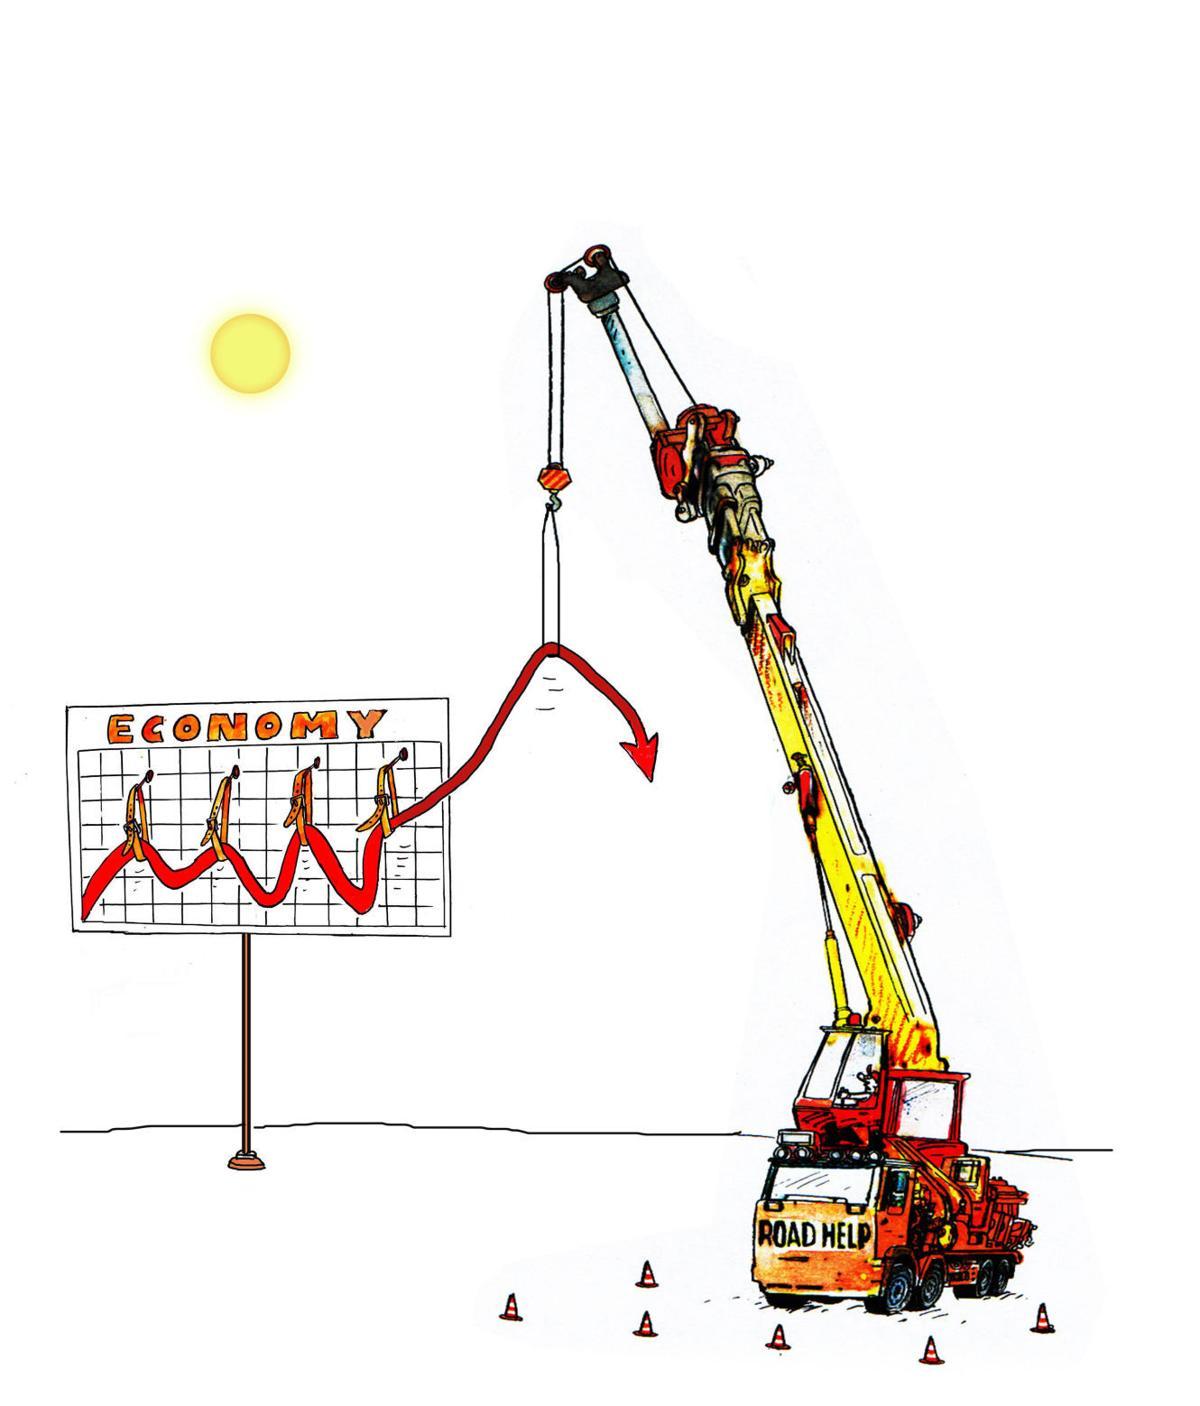 Economic Aid by Pavel Constantin, Romania